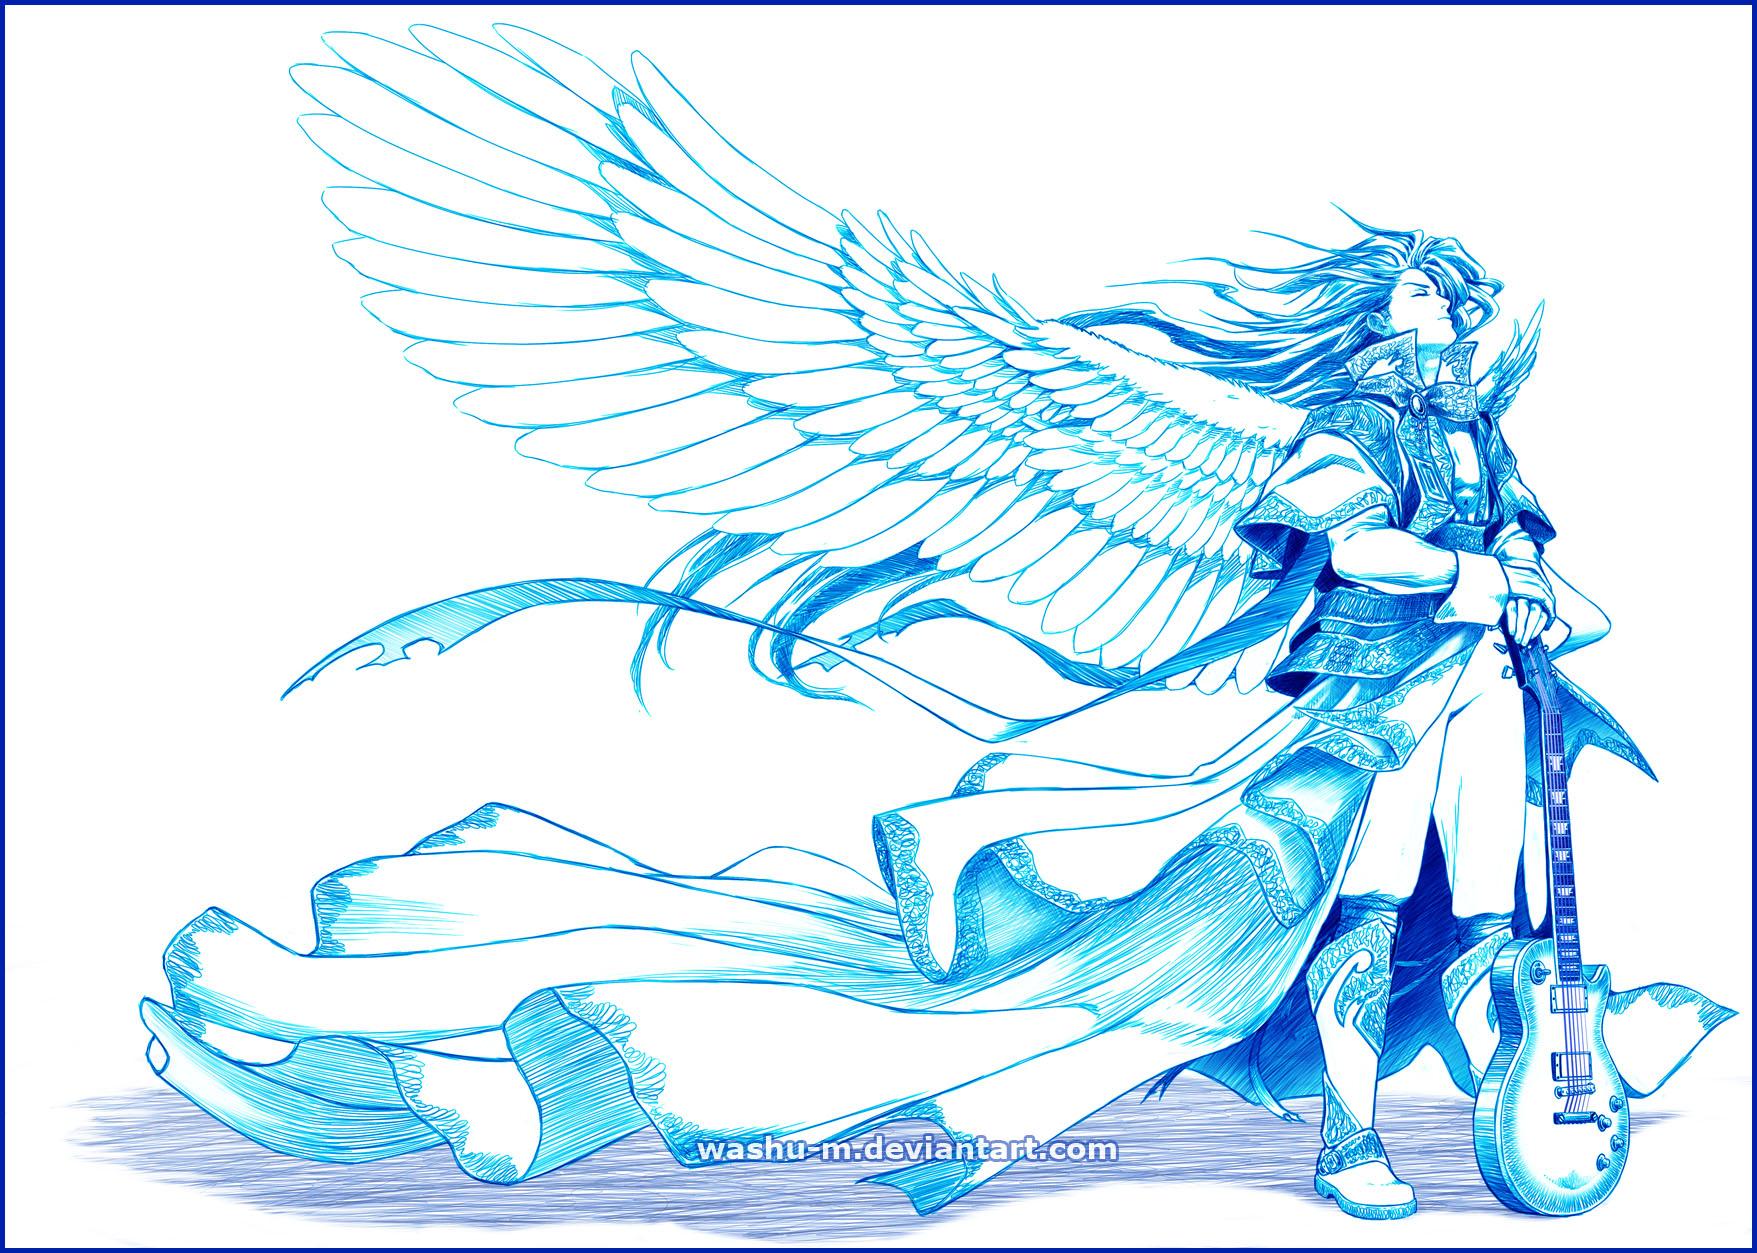 The ANGEL Behind Heaven's Door by Washu-M